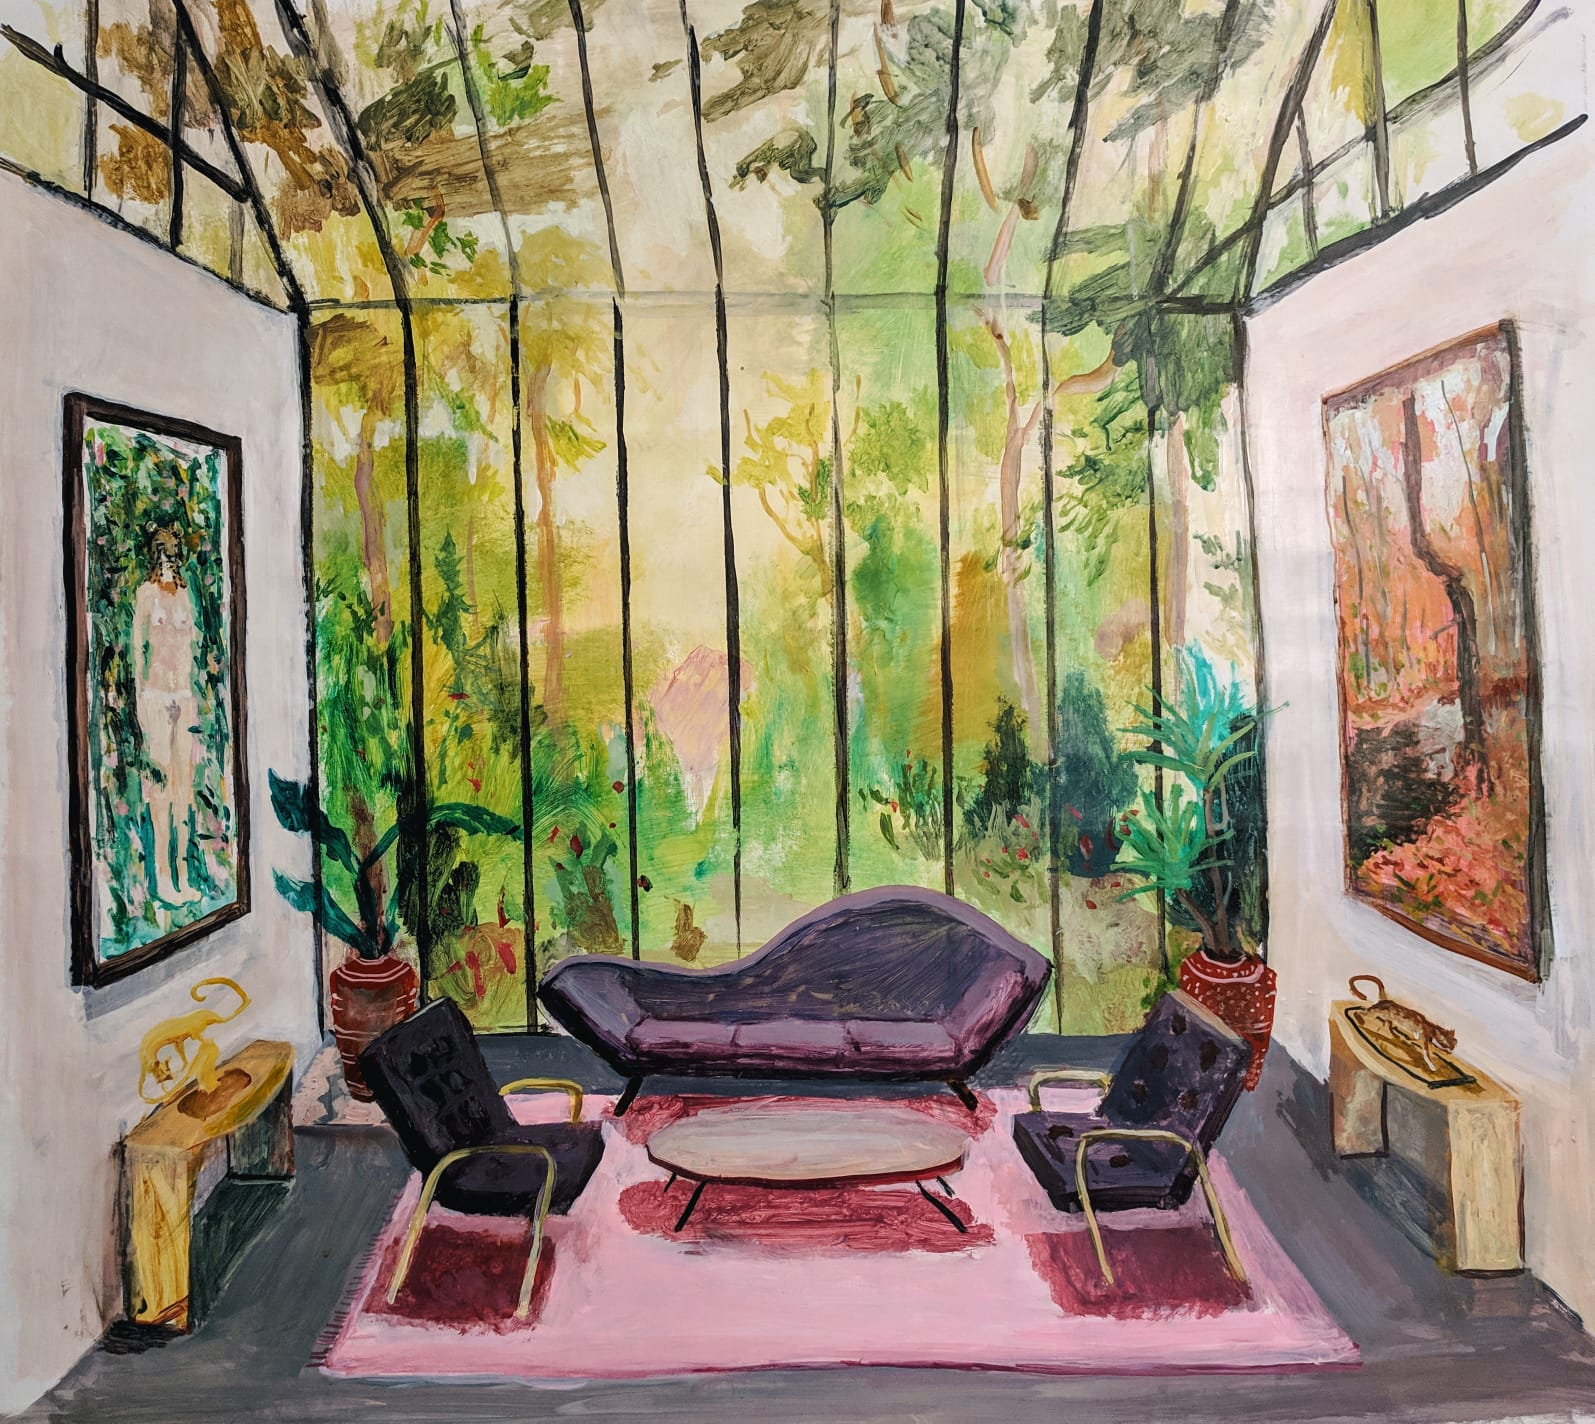 Wildcat Conservatory